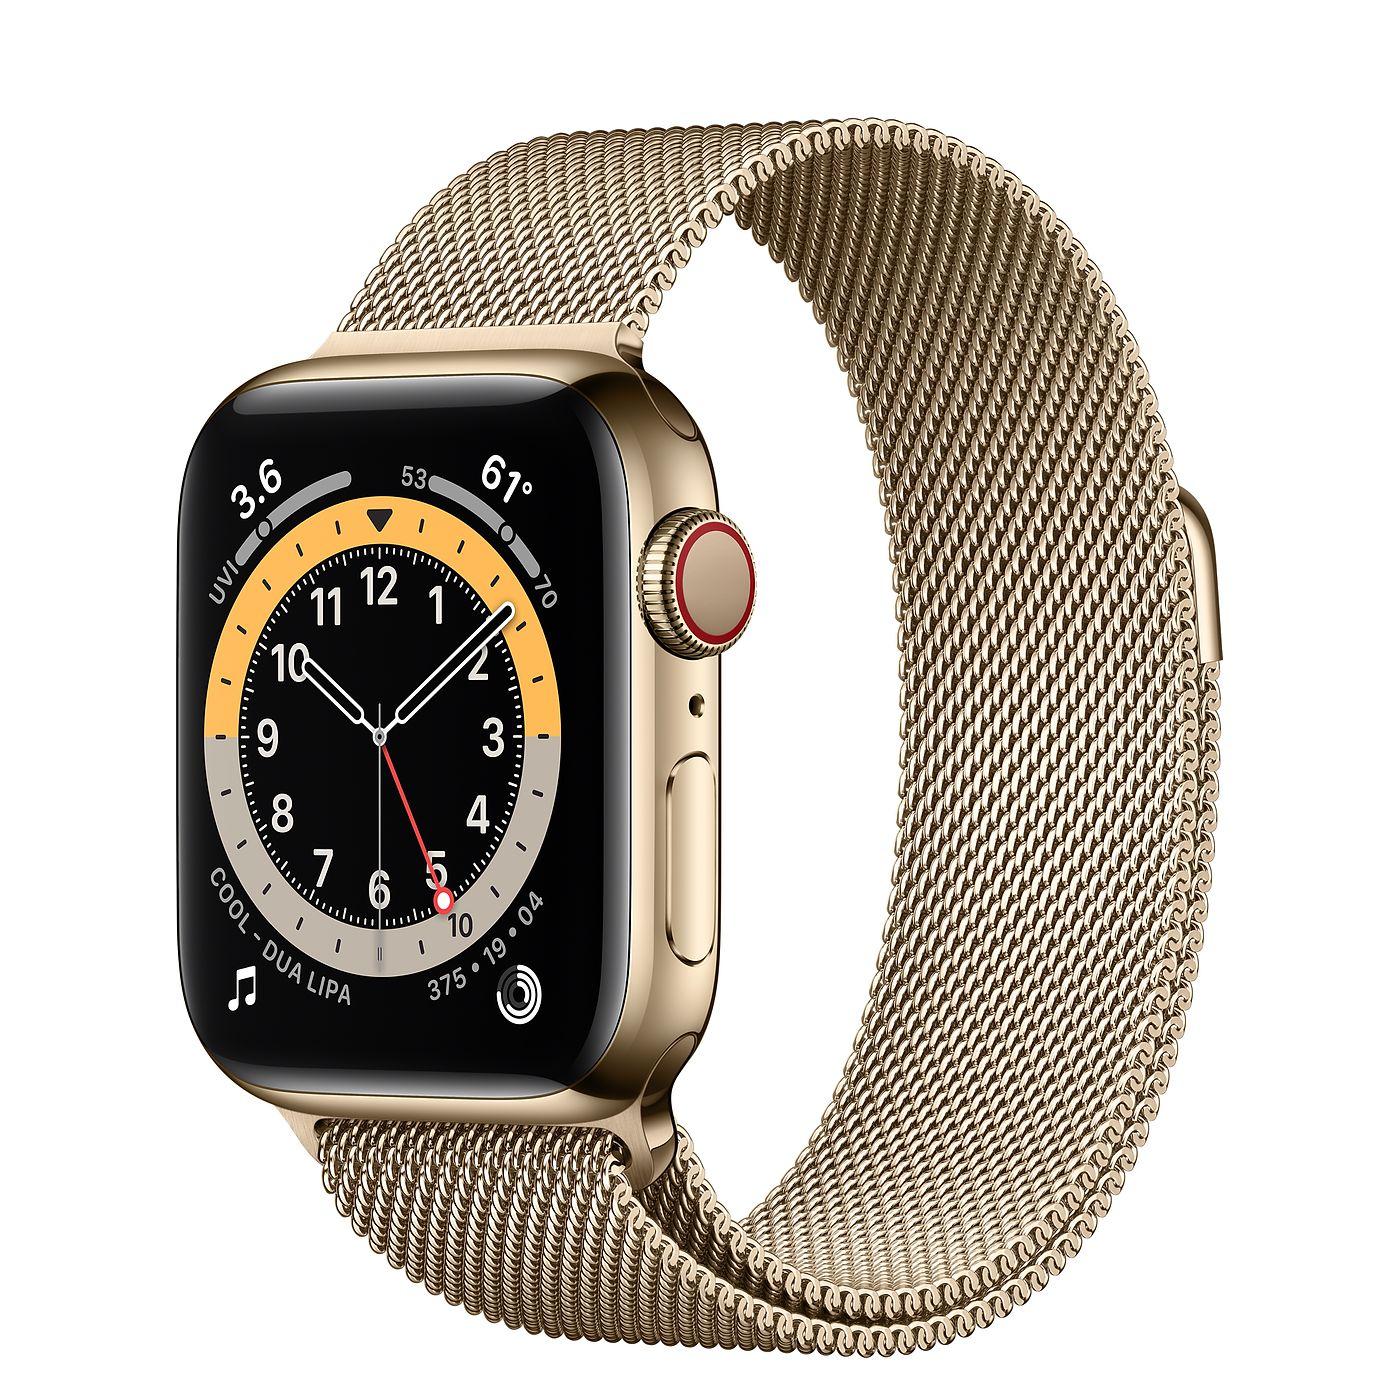 Apple 애플워치 6, GPS+Cellular, 골드 스테인리스 스틸 케이스, 골드 밀레니즈 루프